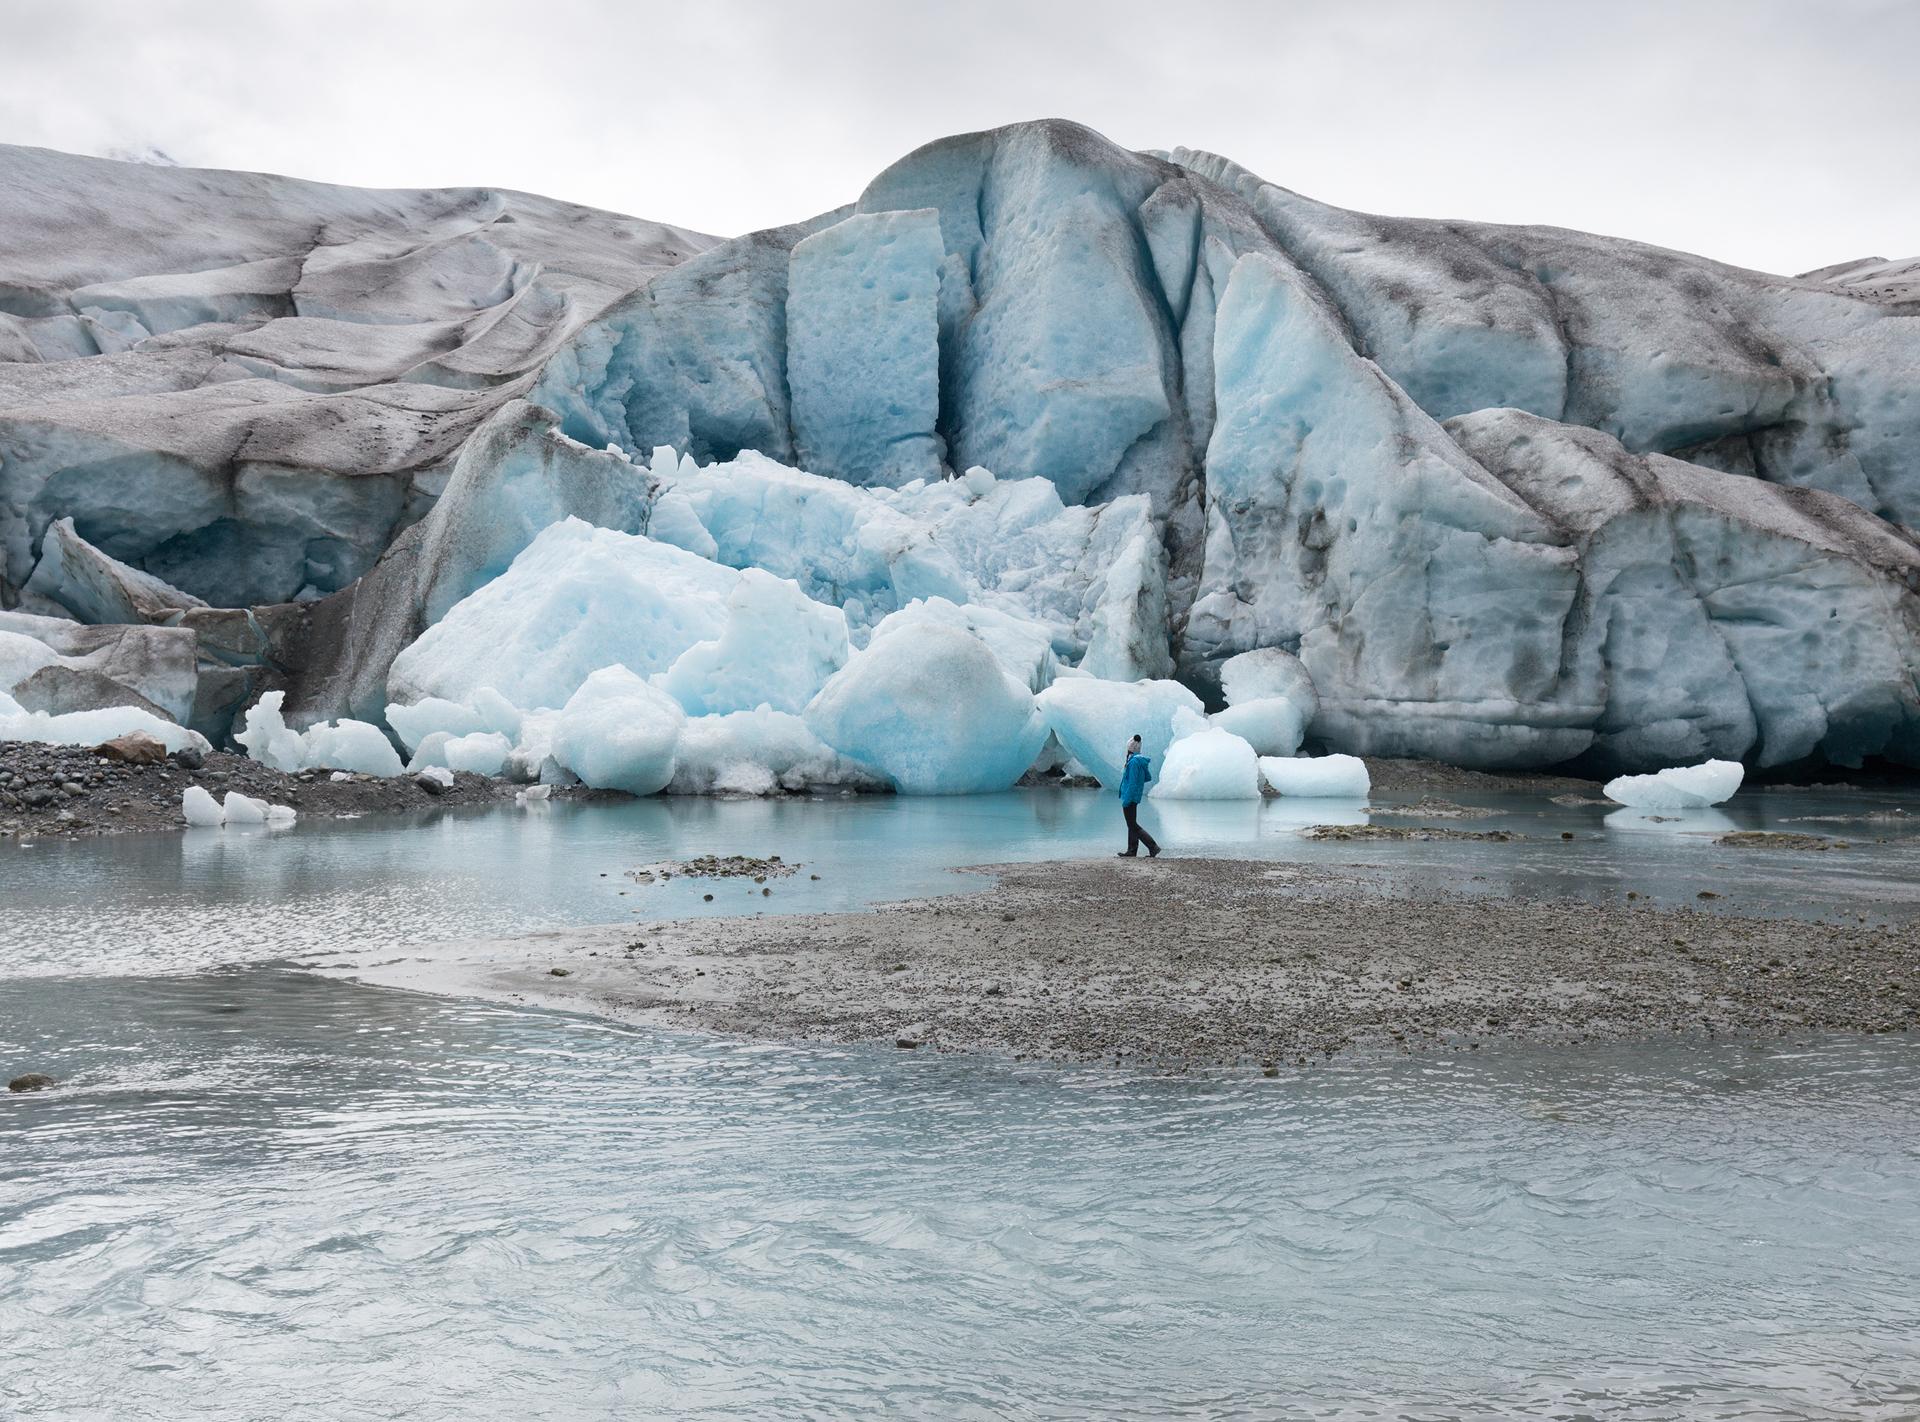 Glacier Bay National Park West Arm Kayaking Camping Trip-35.jpg